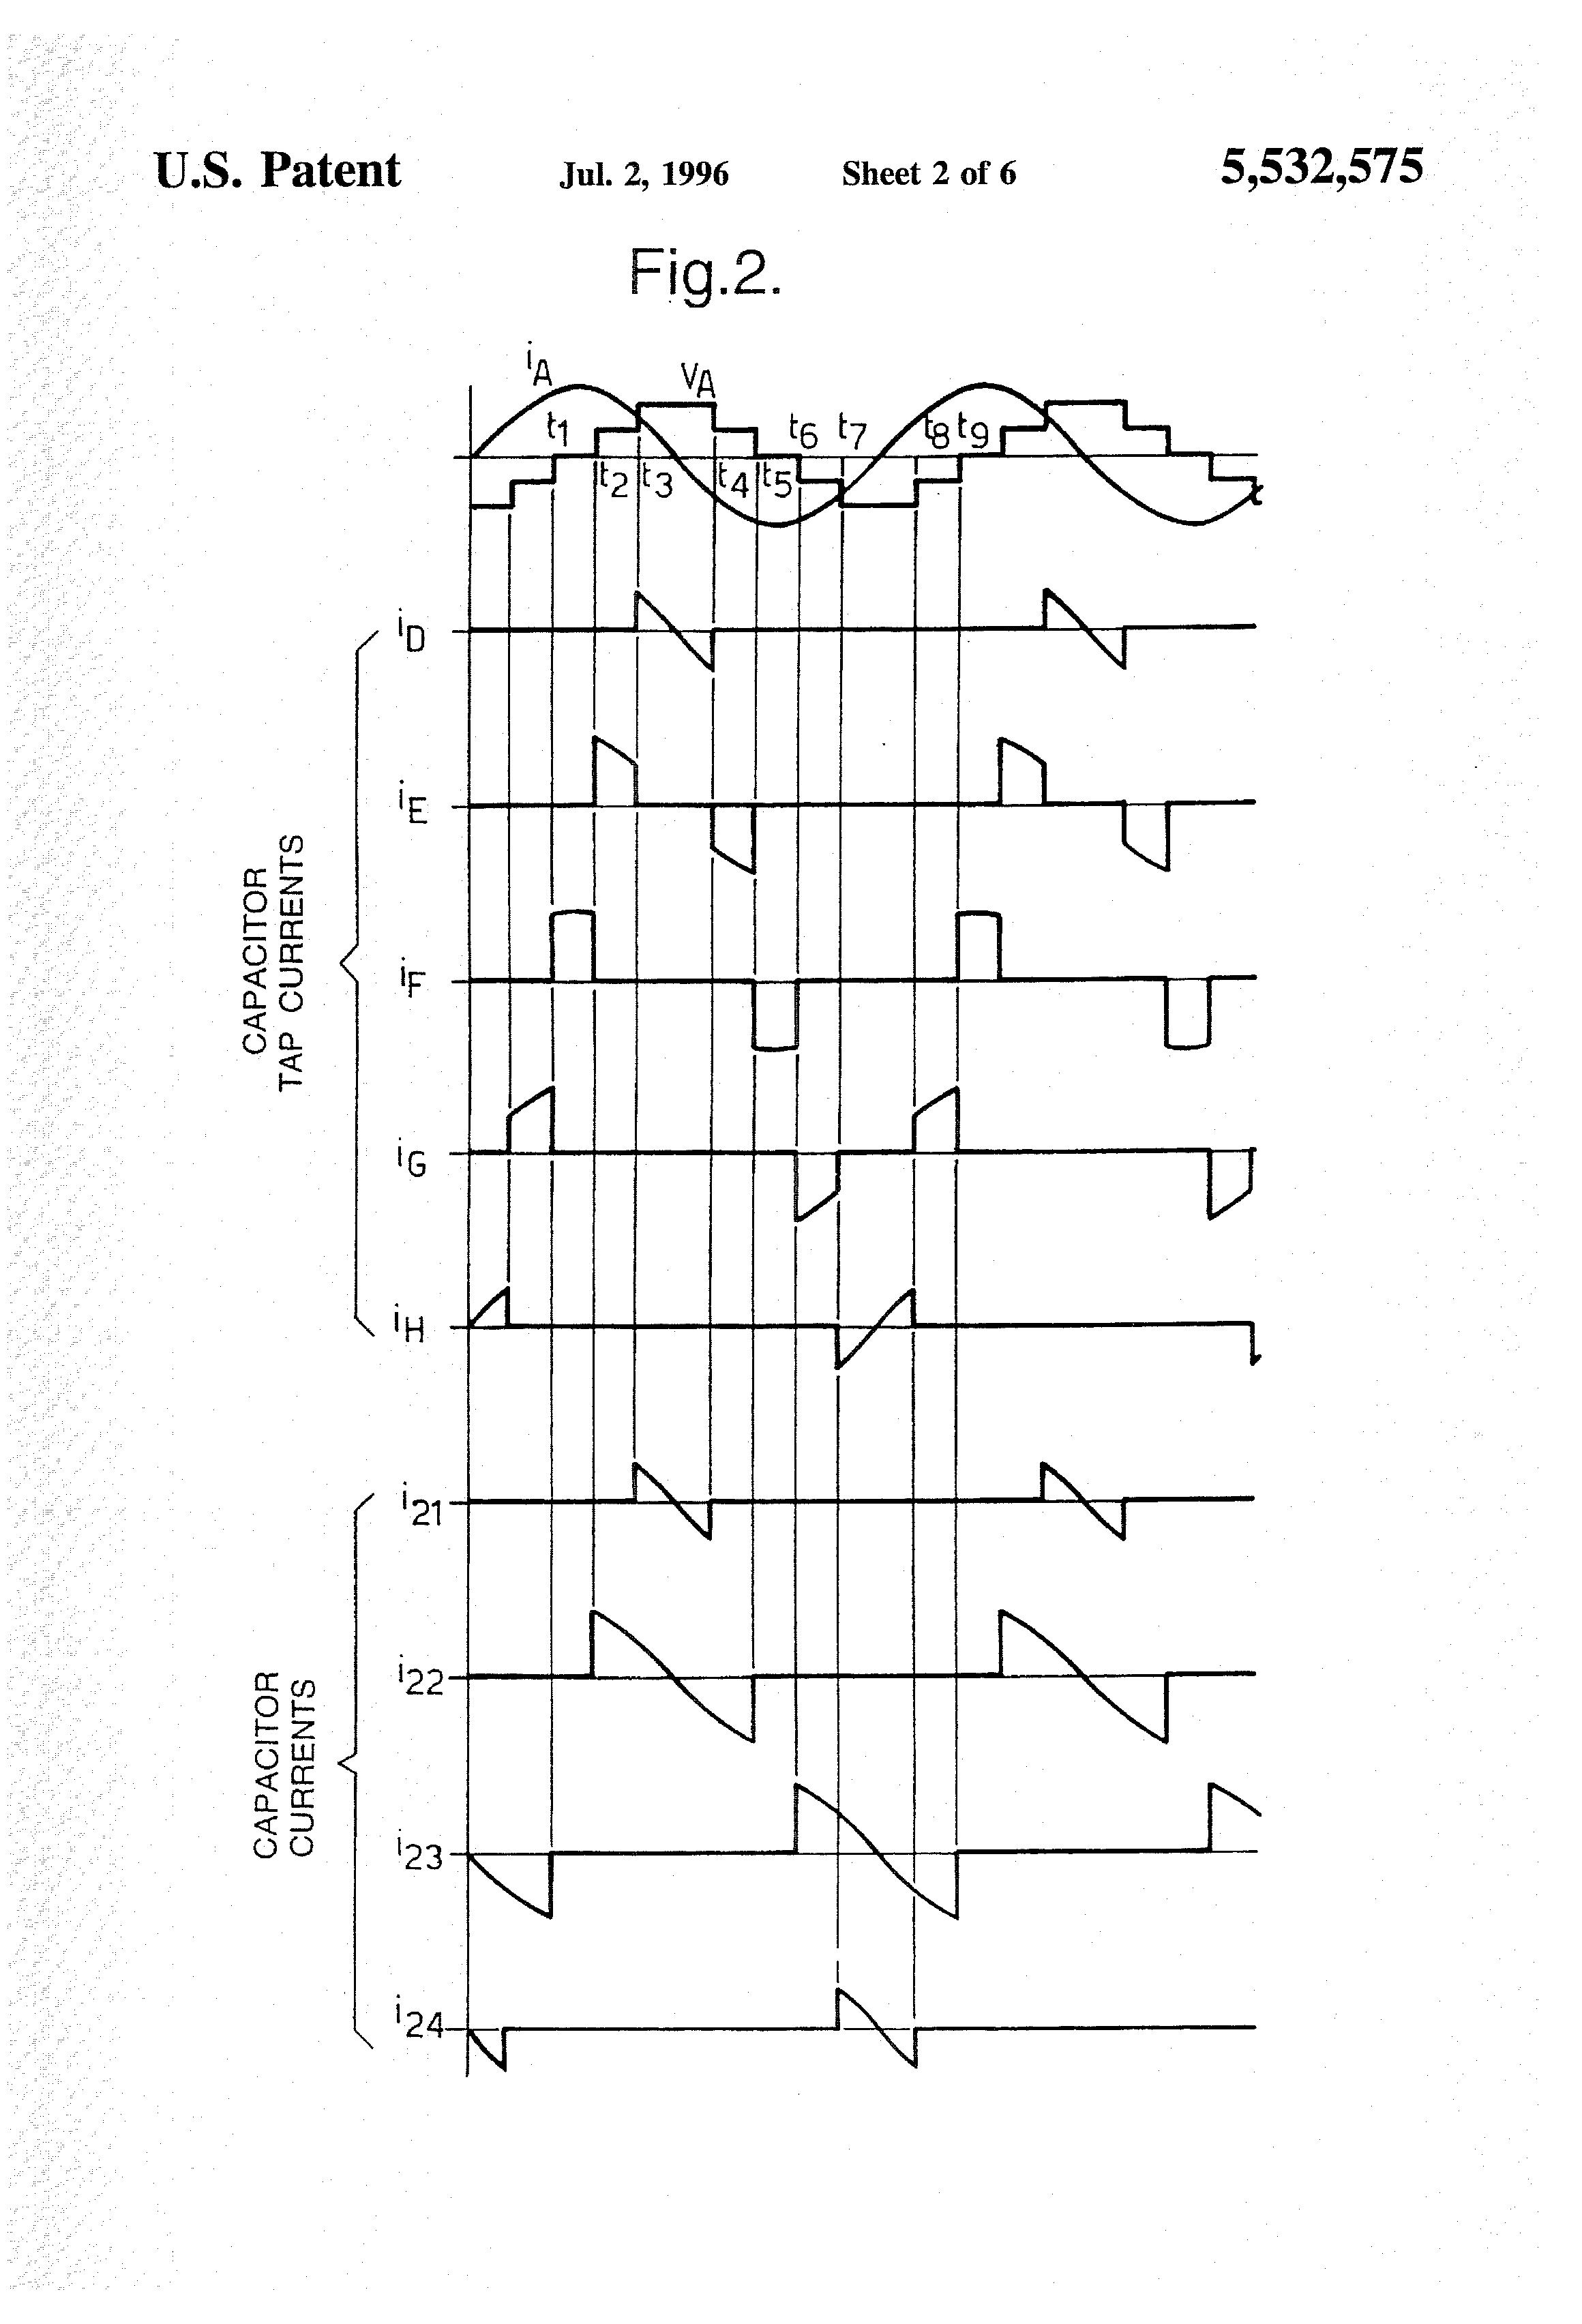 Patent Us5532575 Multilevel Converter With Capacitor Voltage Oscillators Gt Sine Wave Pure Inverter Schematic Diagram Drawing